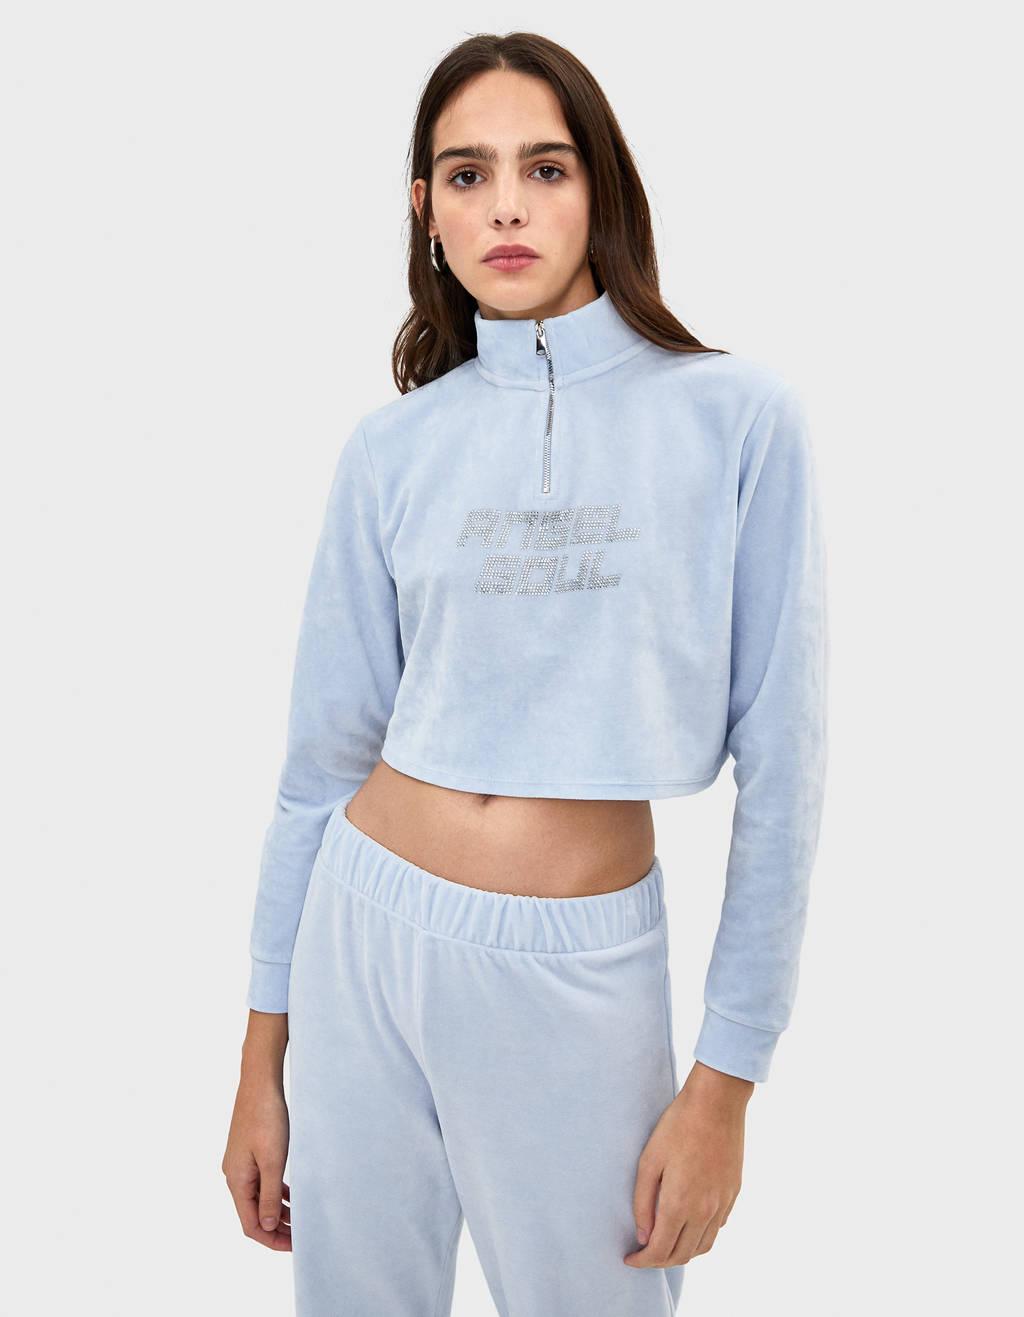 Velvet sweater with shiny details